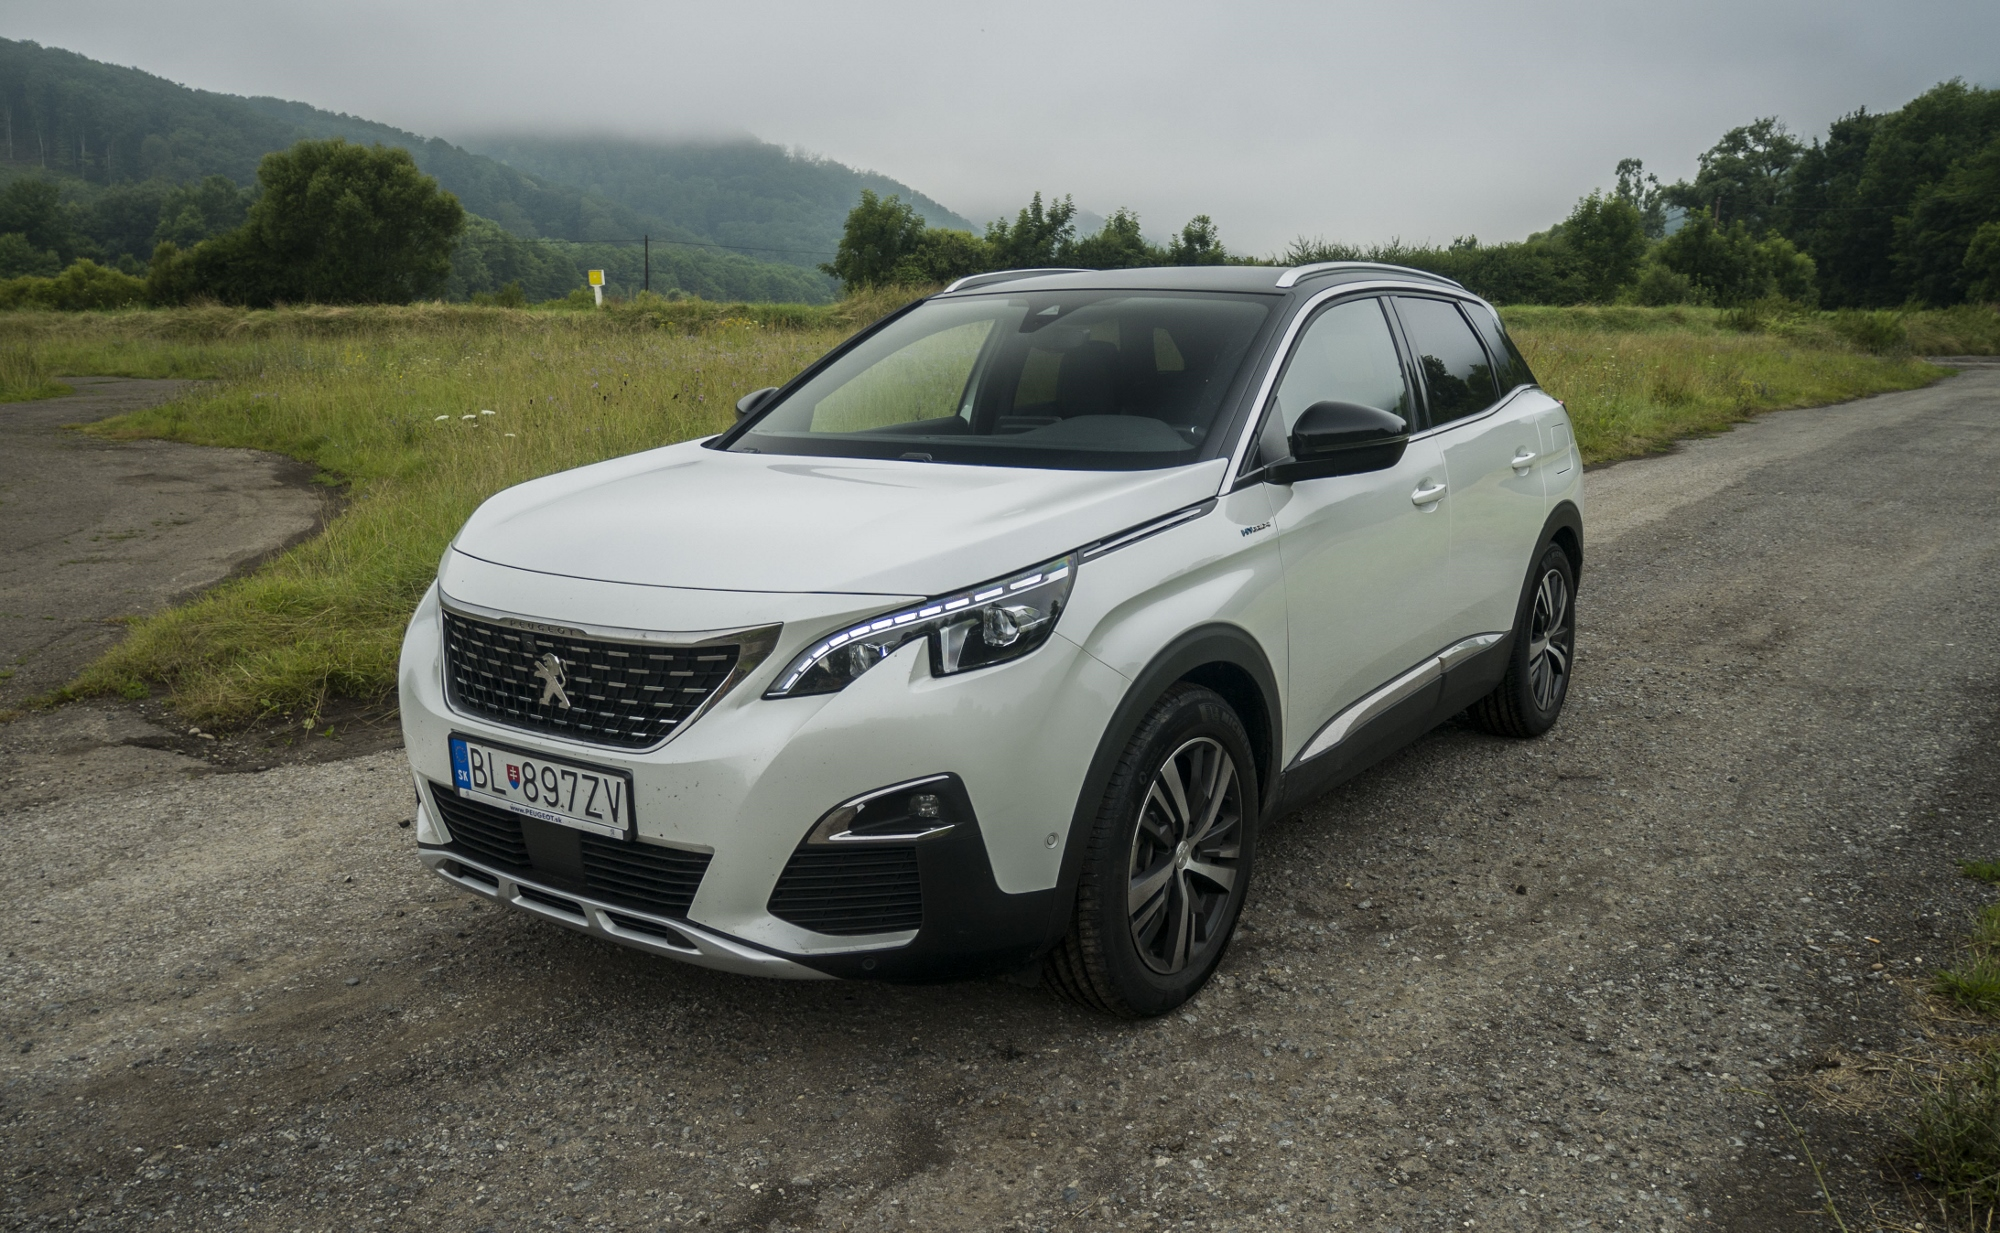 Test: Peugeot 3008 posúva schopnosti plug in hybridov KM93f7Mrcy peugeot-3008-hybrid4-14